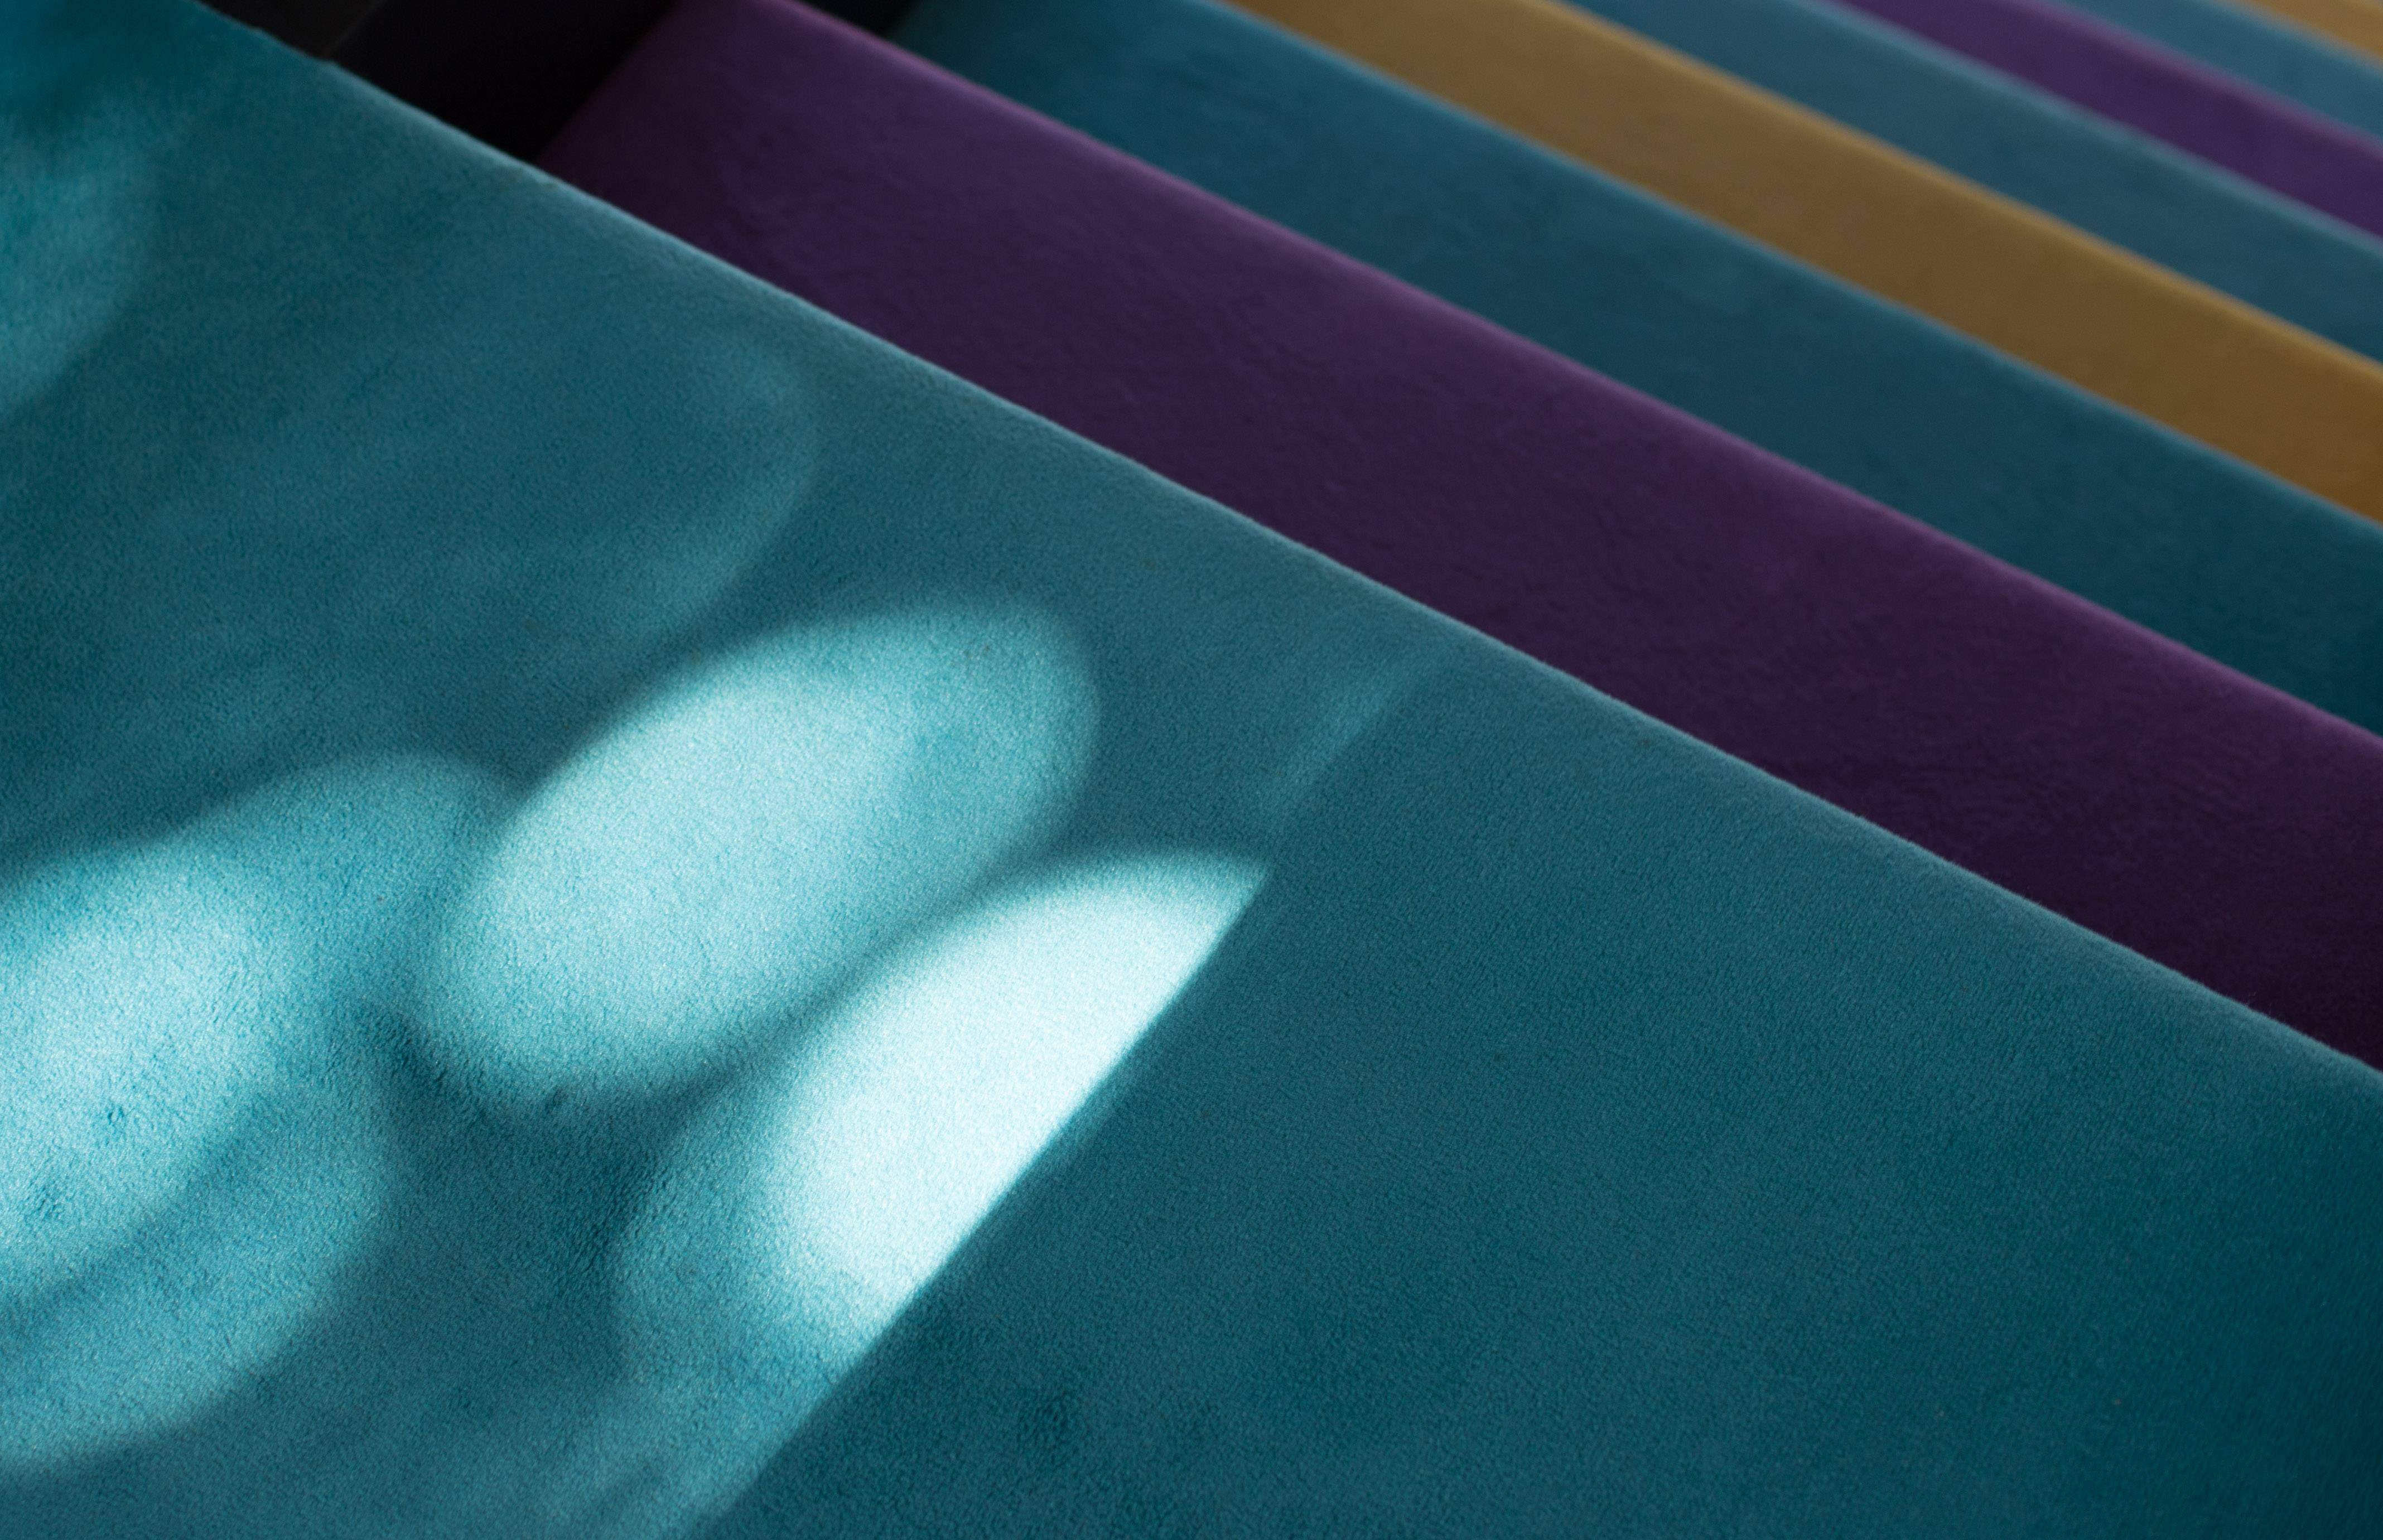 Teppichboden | Bild: Rainer Sturm / pixelio.de